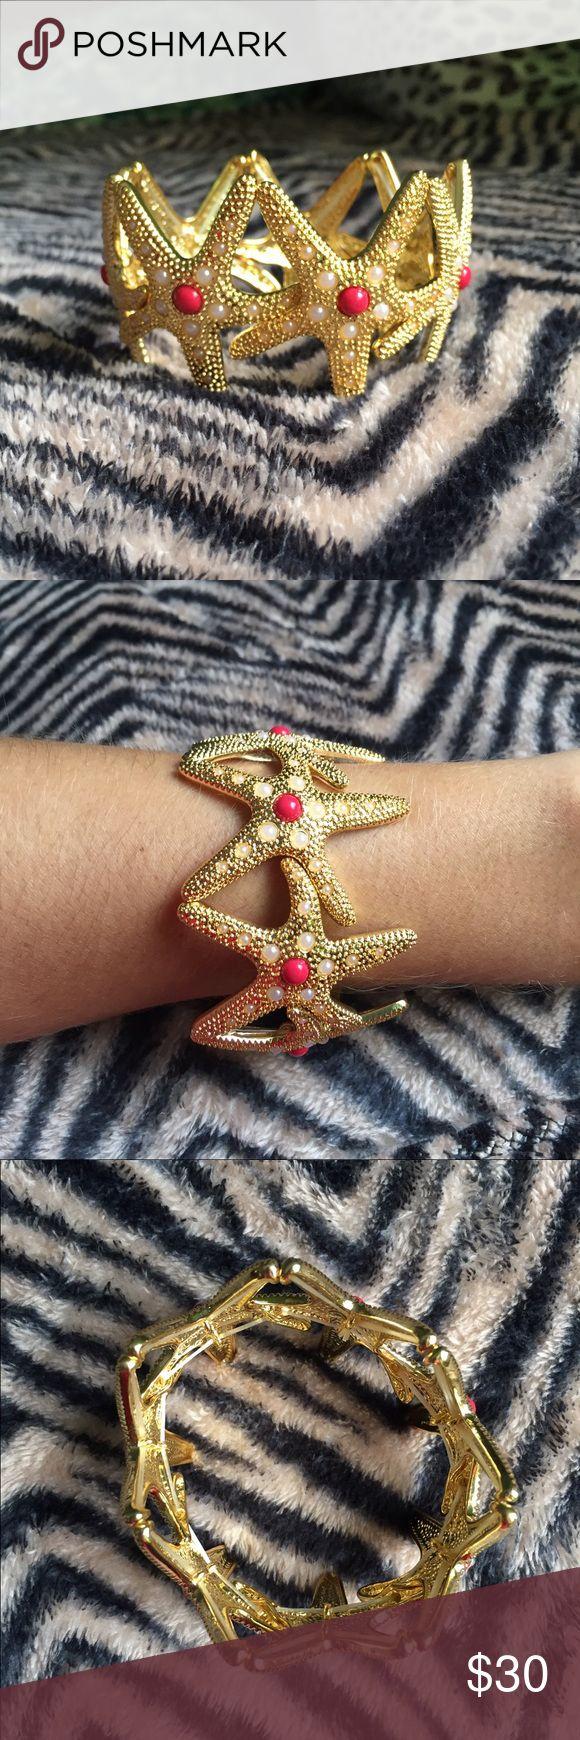 Lilly Pulitzer Starfish Stretch Bracelet Lilly Pulitzer Starfish Stretch Bracelet - never worn! Lilly Pulitzer Jewelry Bracelets